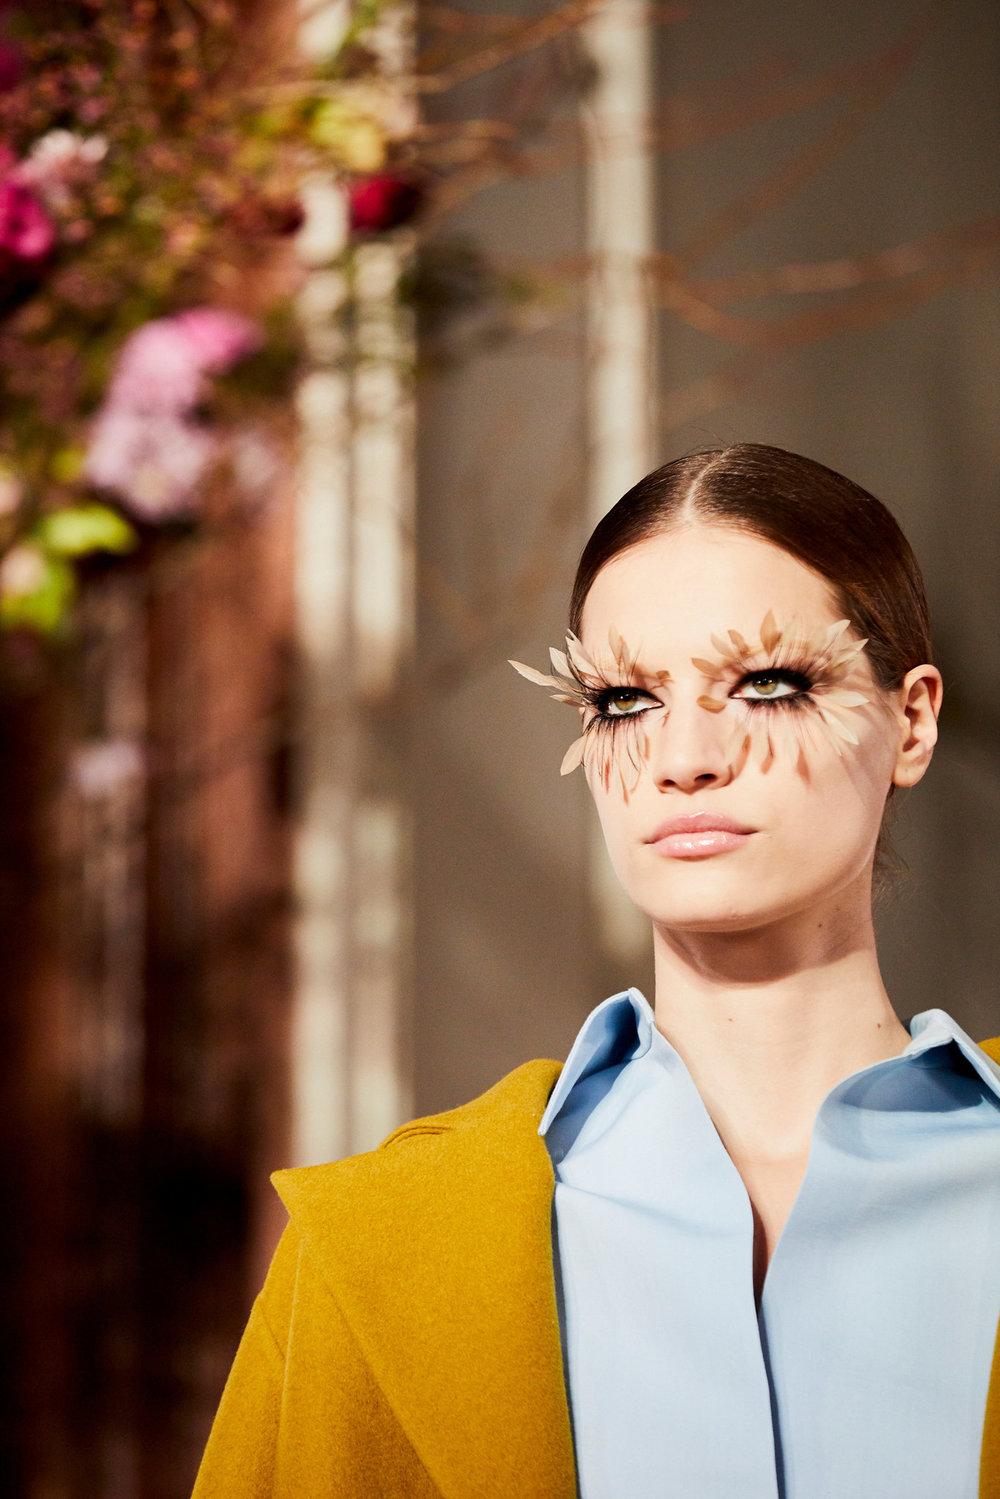 Couture-slide-KNZQ-superJumbo[1].jpg